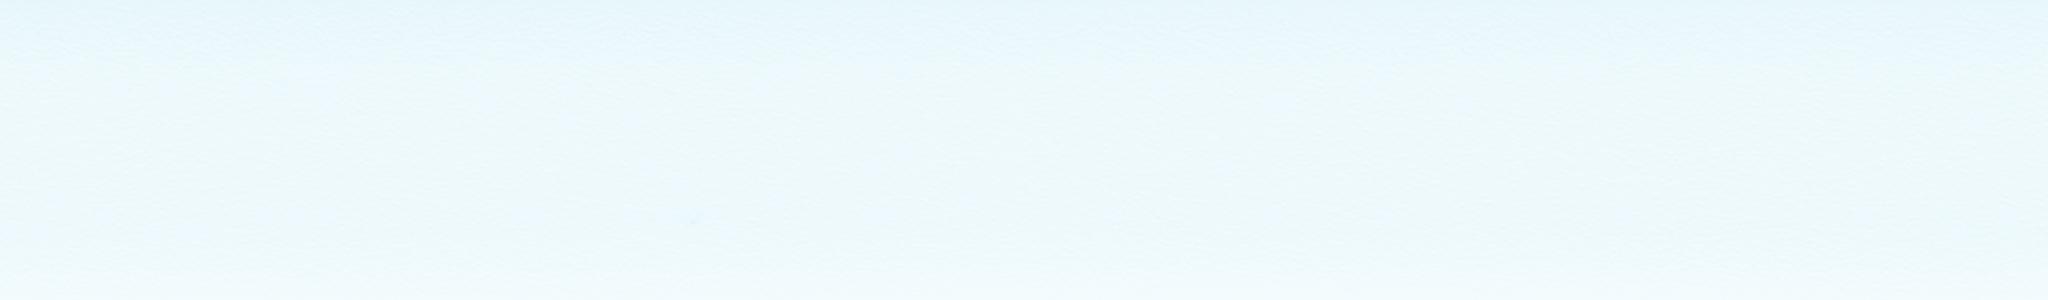 HU 157179 ABS hrana modrá světlá perla 101